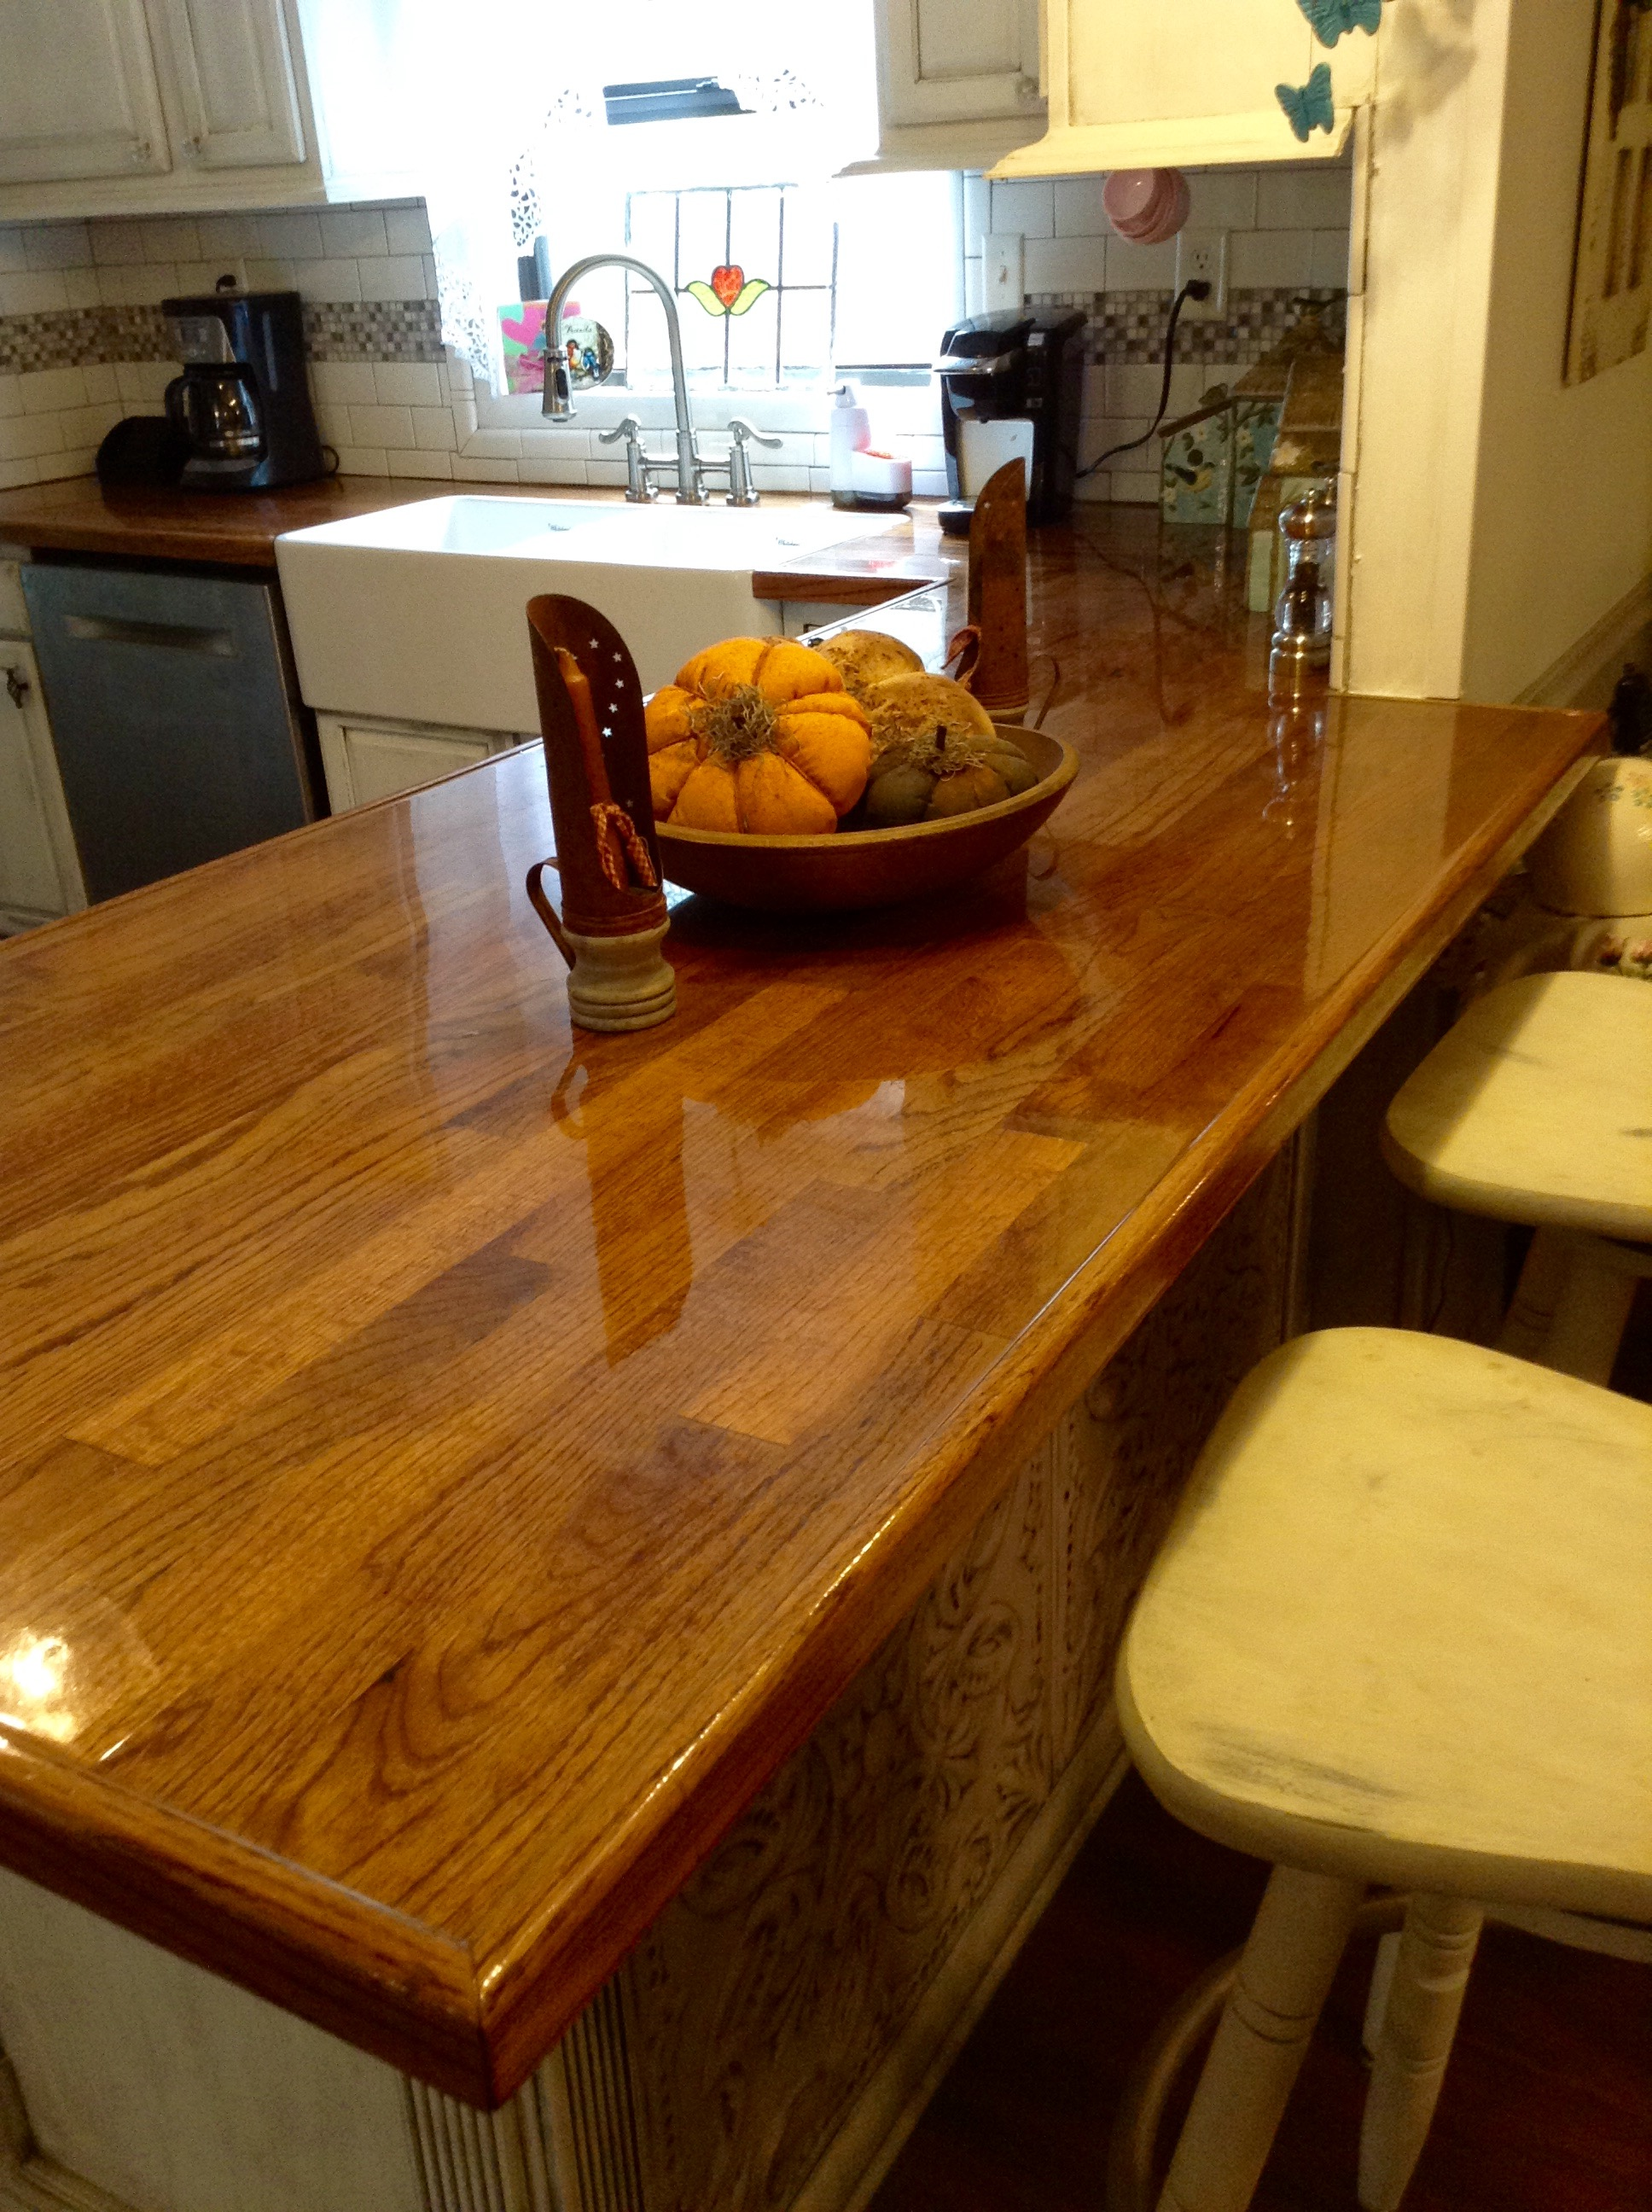 Best Kitchen Gallery: Remodelaholic Diy Butcher Block Wood Countertop Reviews of 2x4 Kitchen Counter on rachelxblog.com